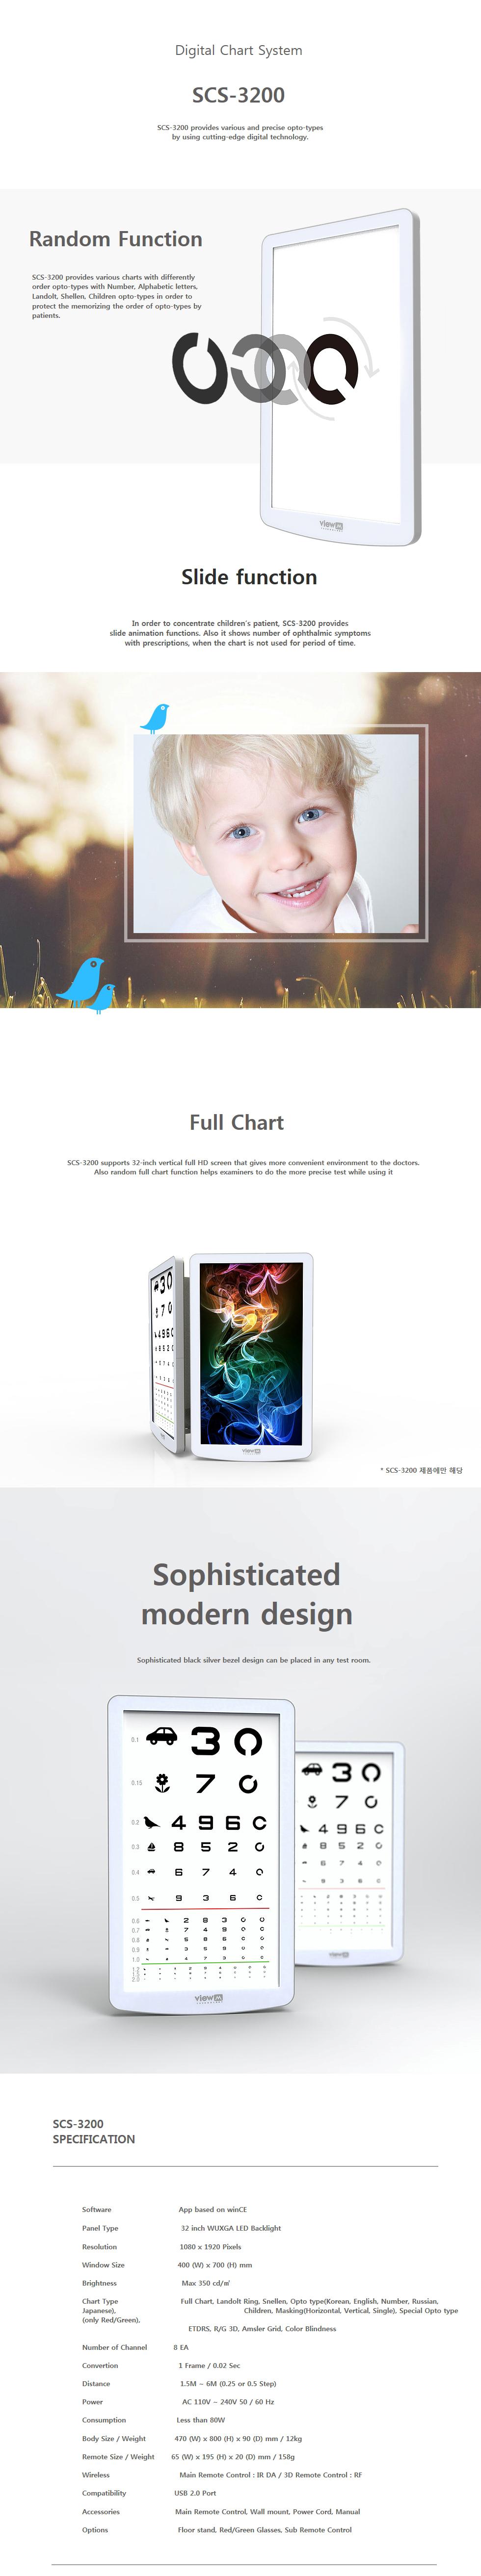 VIEW-M TECH Digital Chart System SCS-3200